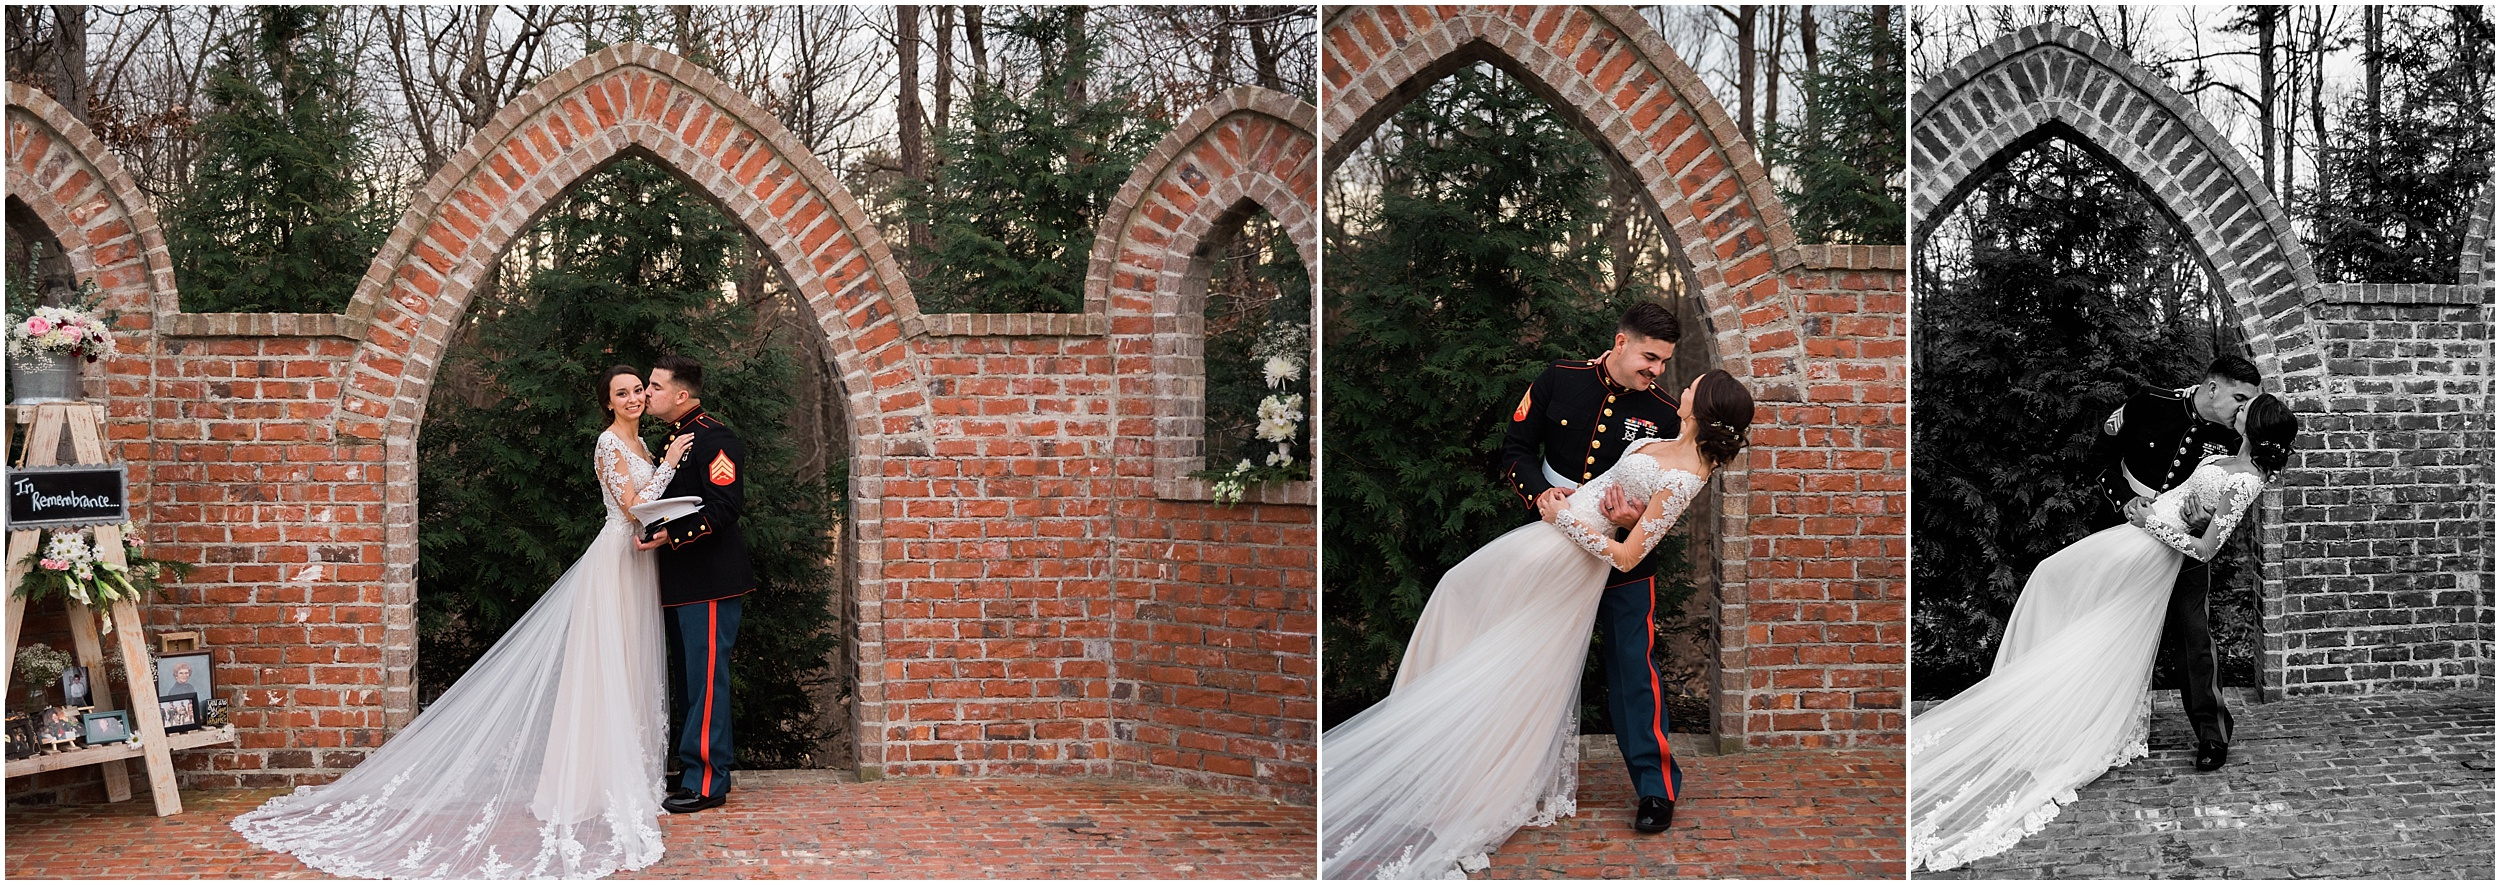 Ariel & Josh Southern Wedding in Monroe, North Carolina_0084.jpg